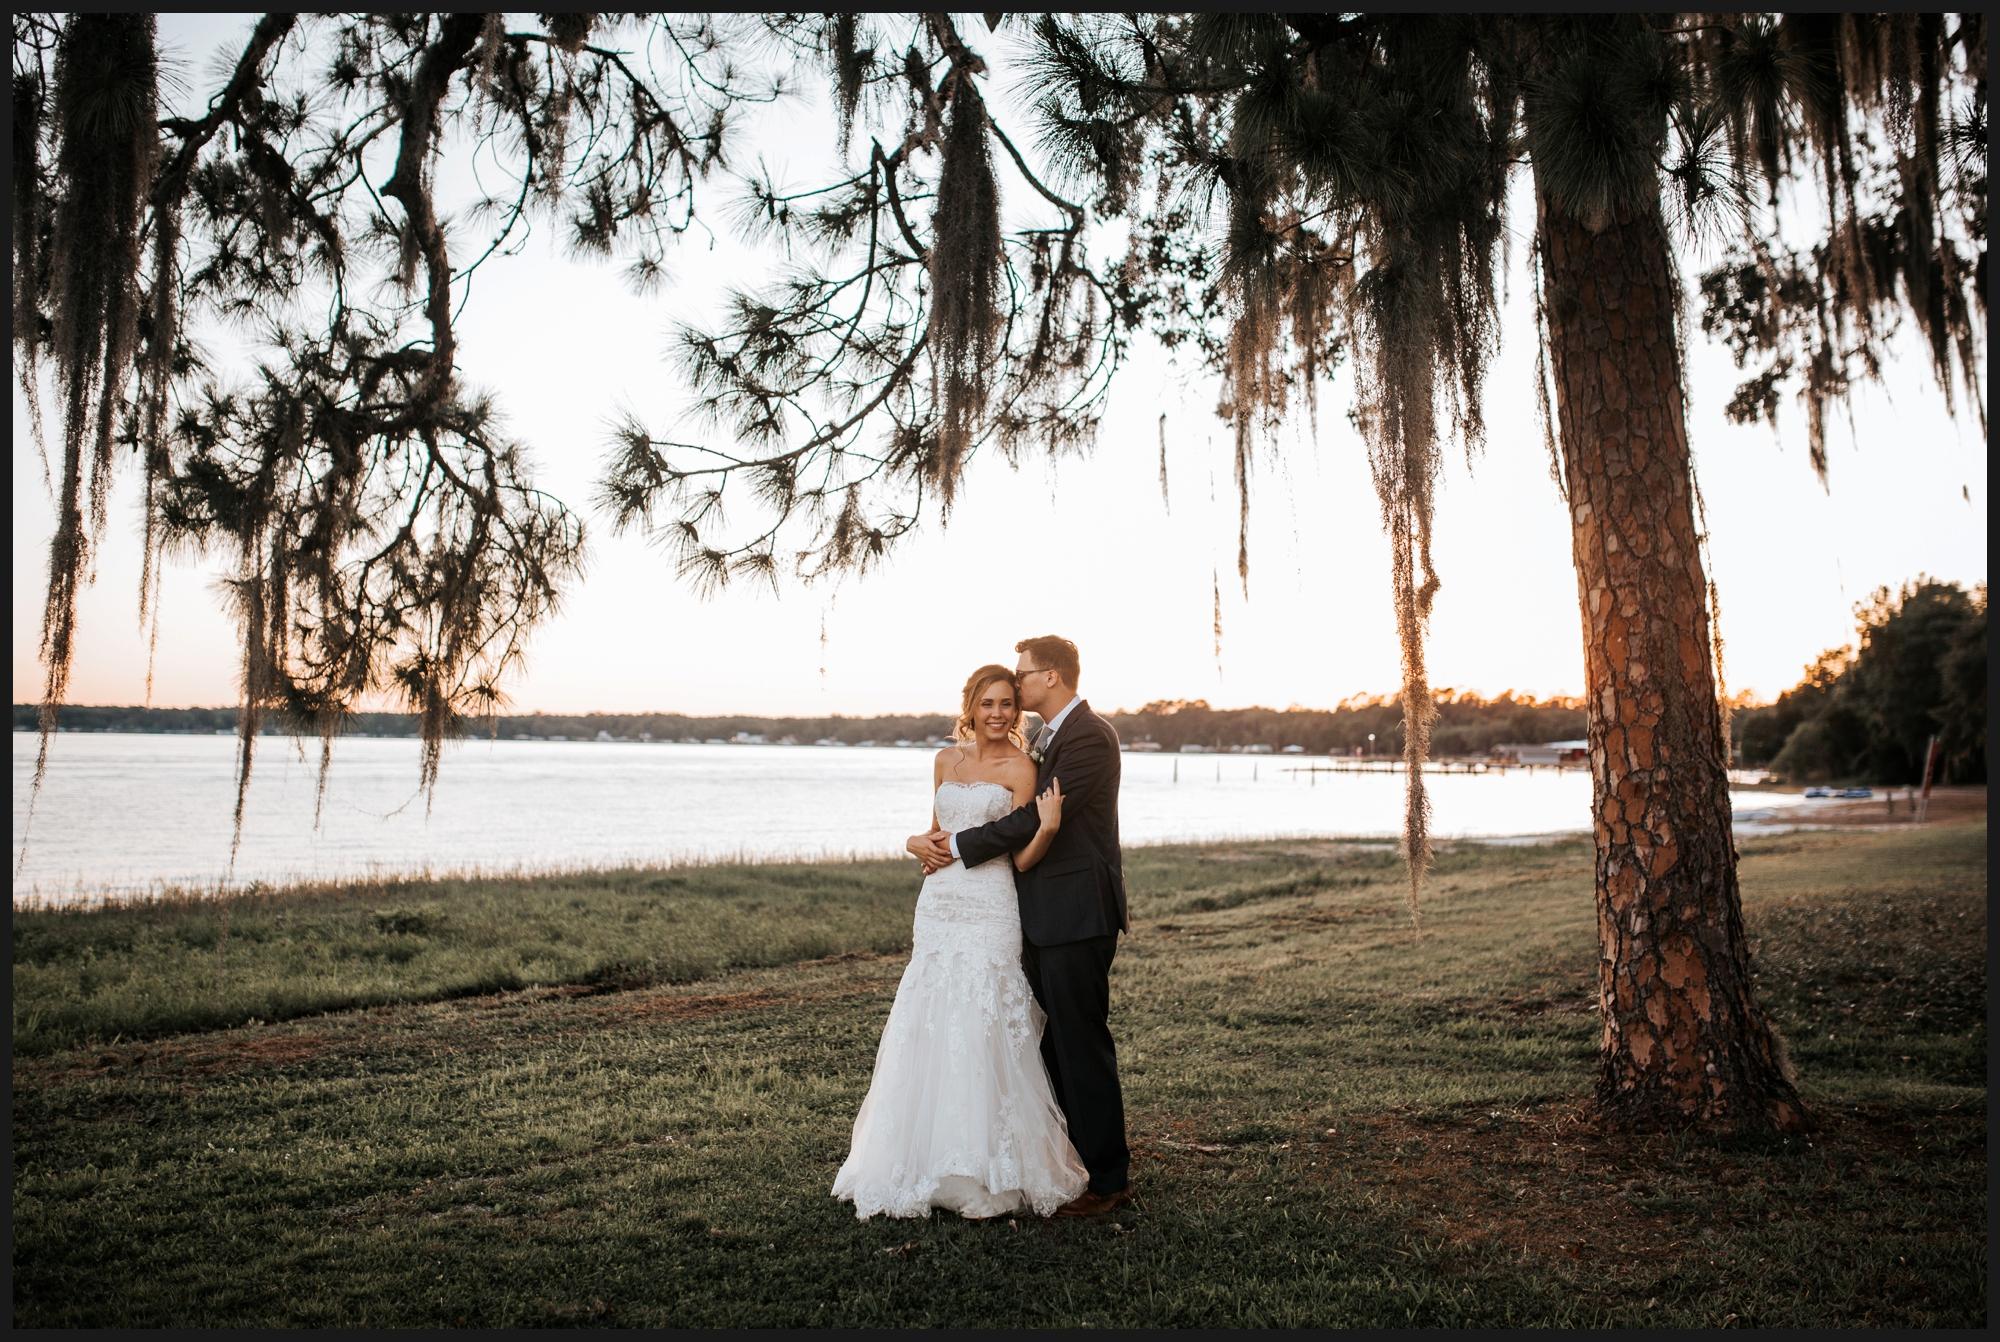 Orlando-Wedding-Photographer-destination-wedding-photographer-florida-wedding-photographer-bohemian-wedding-photographer_0118.jpg